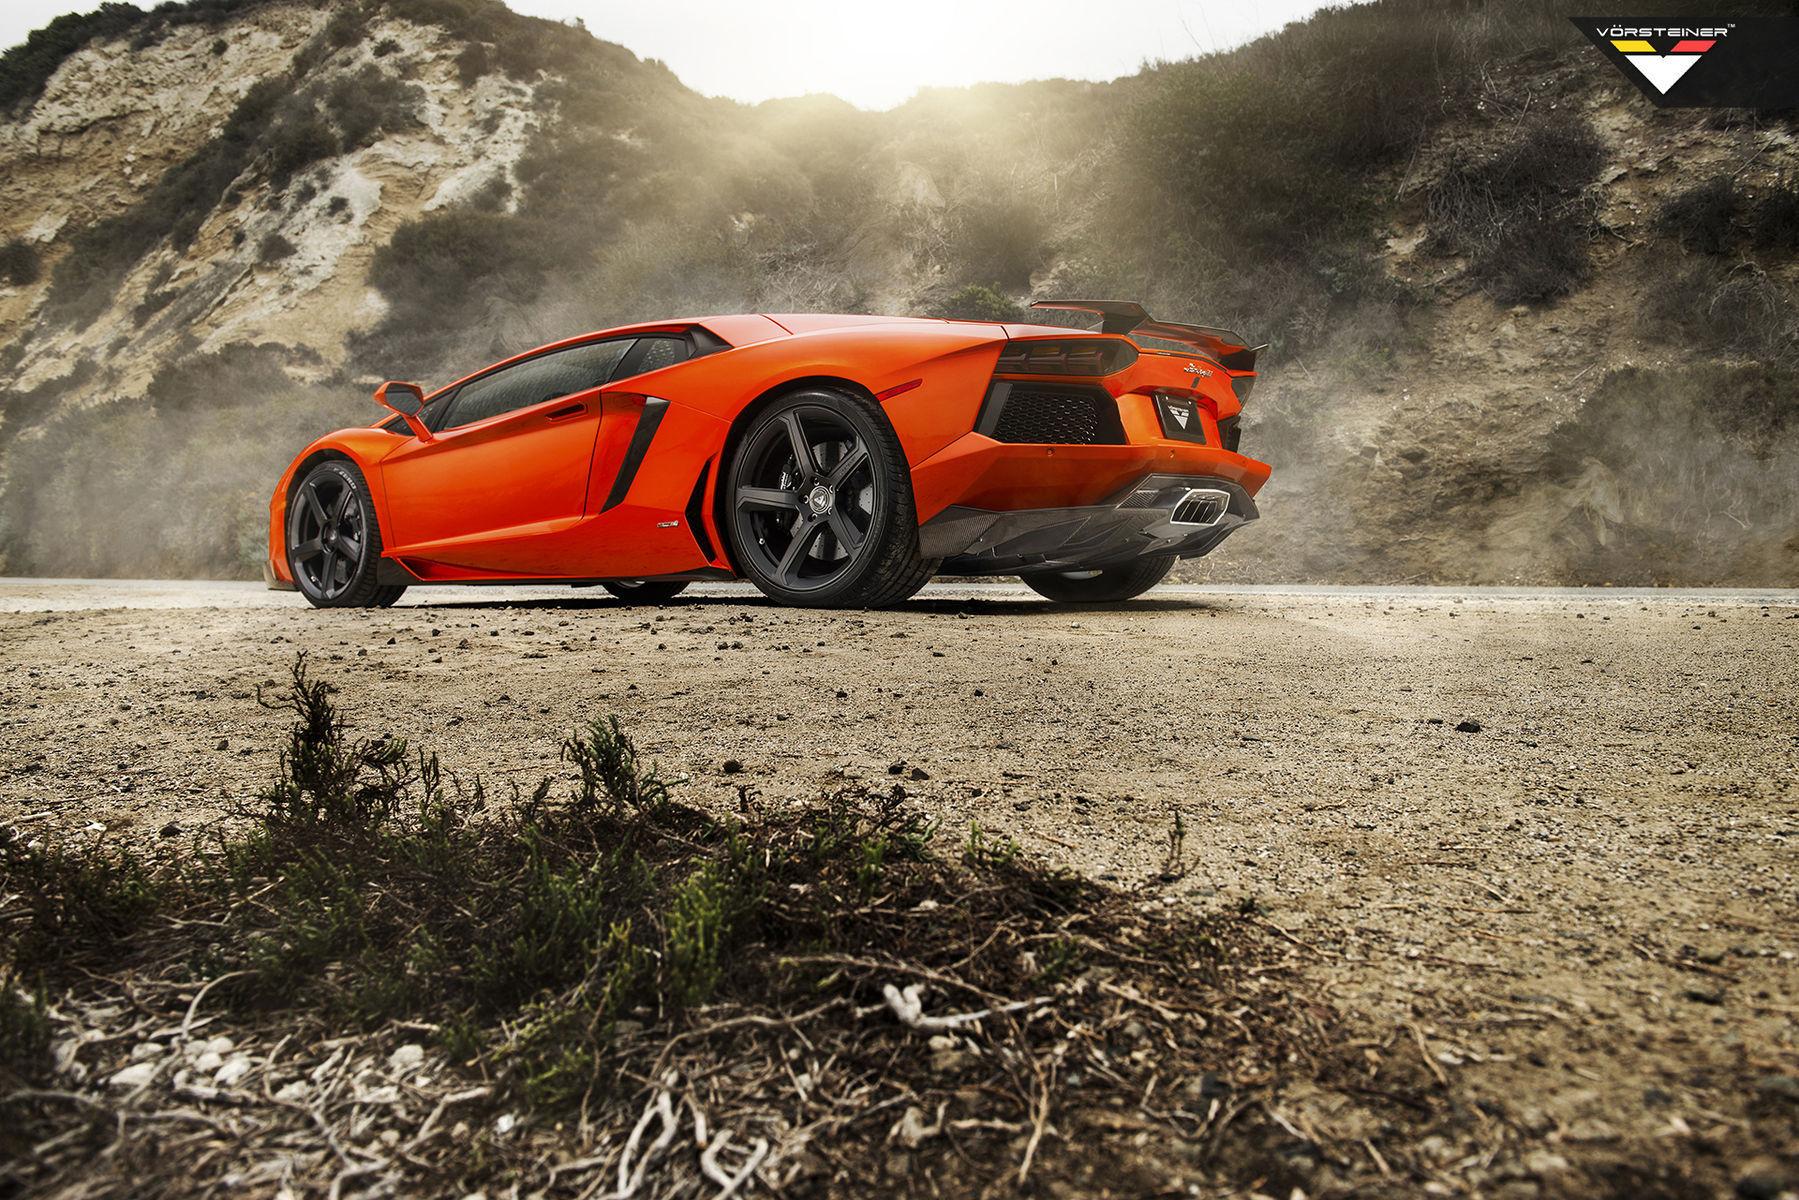 2014 Lamborghini Aventador | Lamborghini Verde Ithaca Aventador-V Roadster